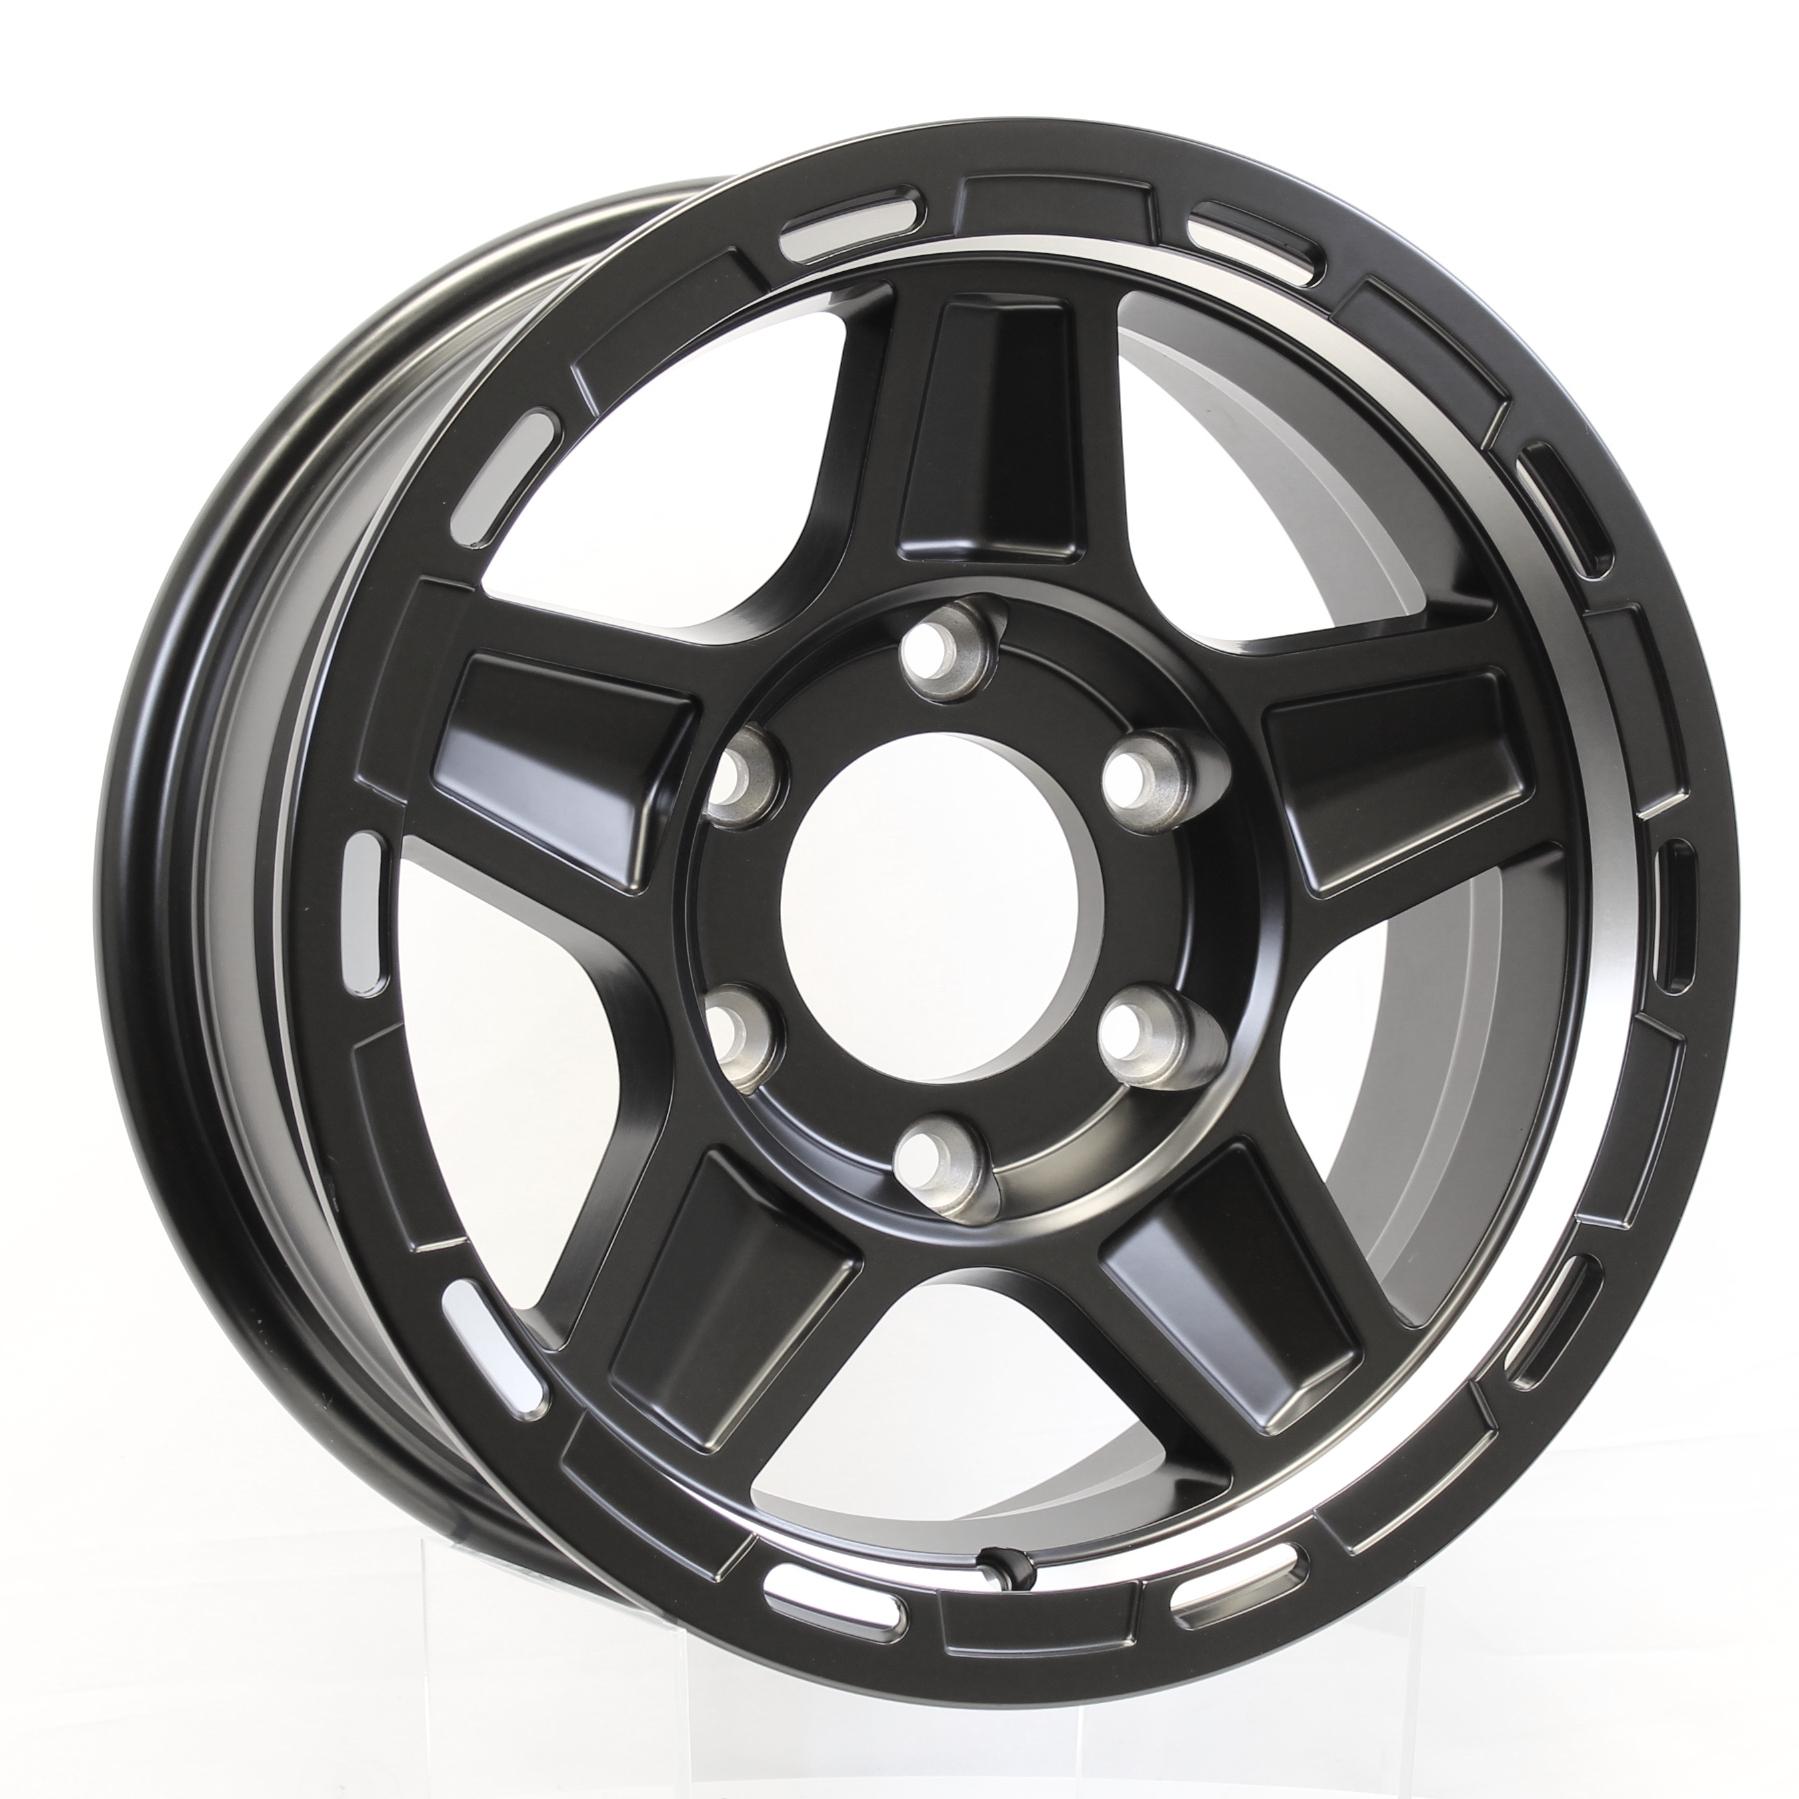 Hercules- 15x6 6-5.5 Matte Black-Full Paint Aluminum Trailer Wheel Image